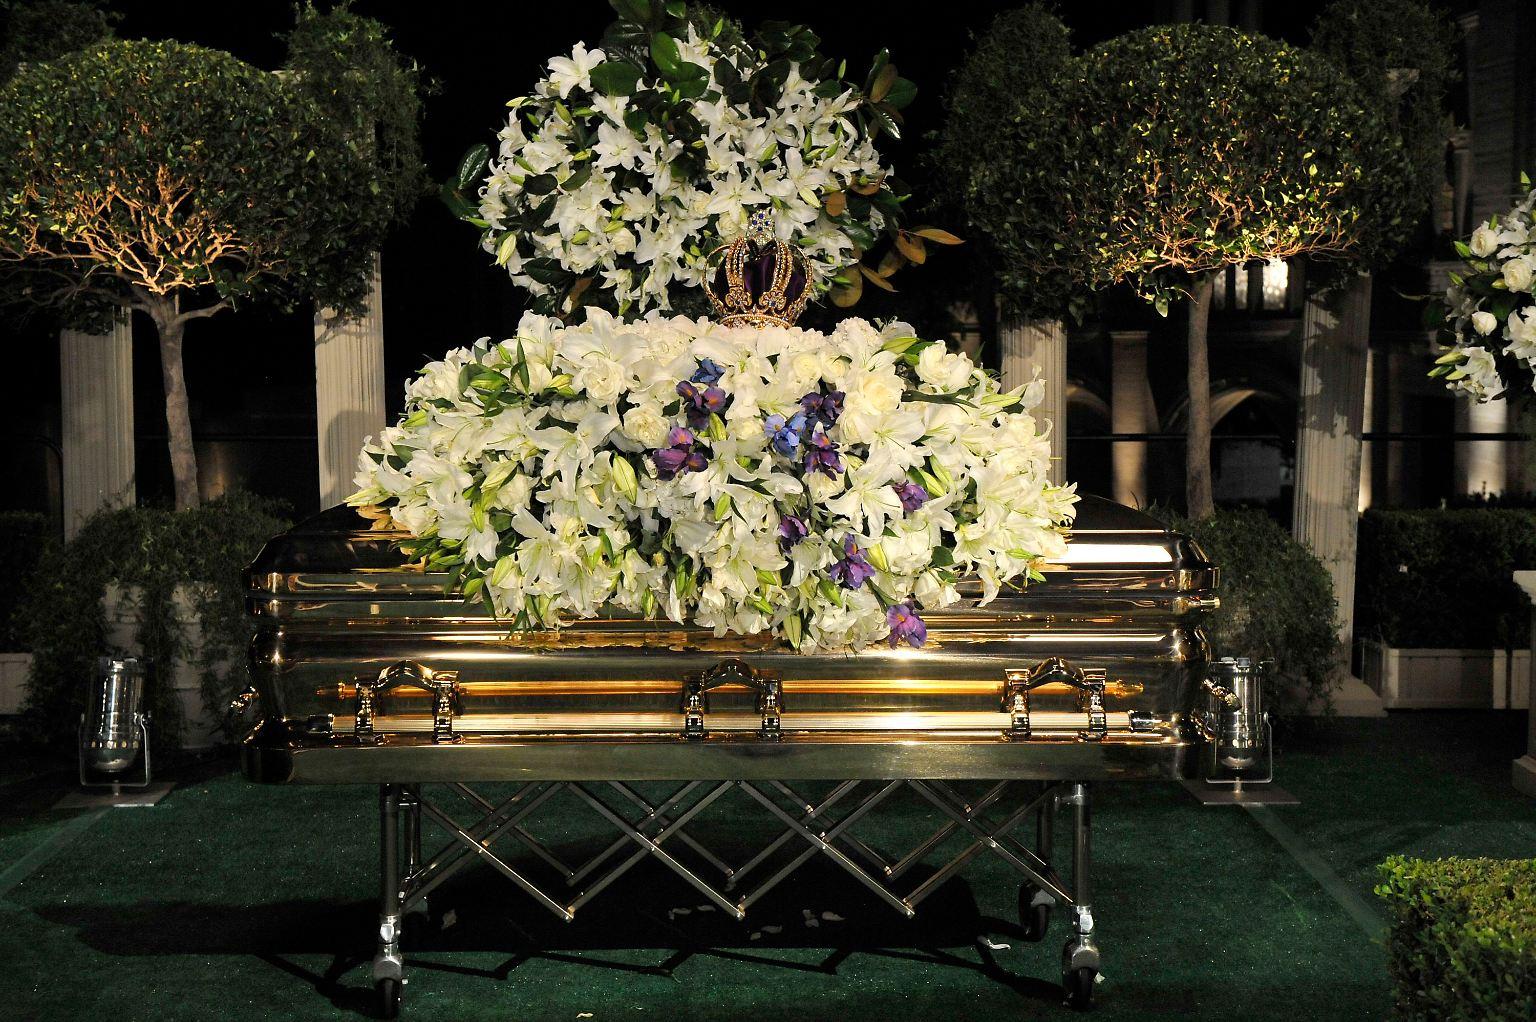 Michael_Jackson_Funeral_NY121.jpg1983473478084451413.jpg